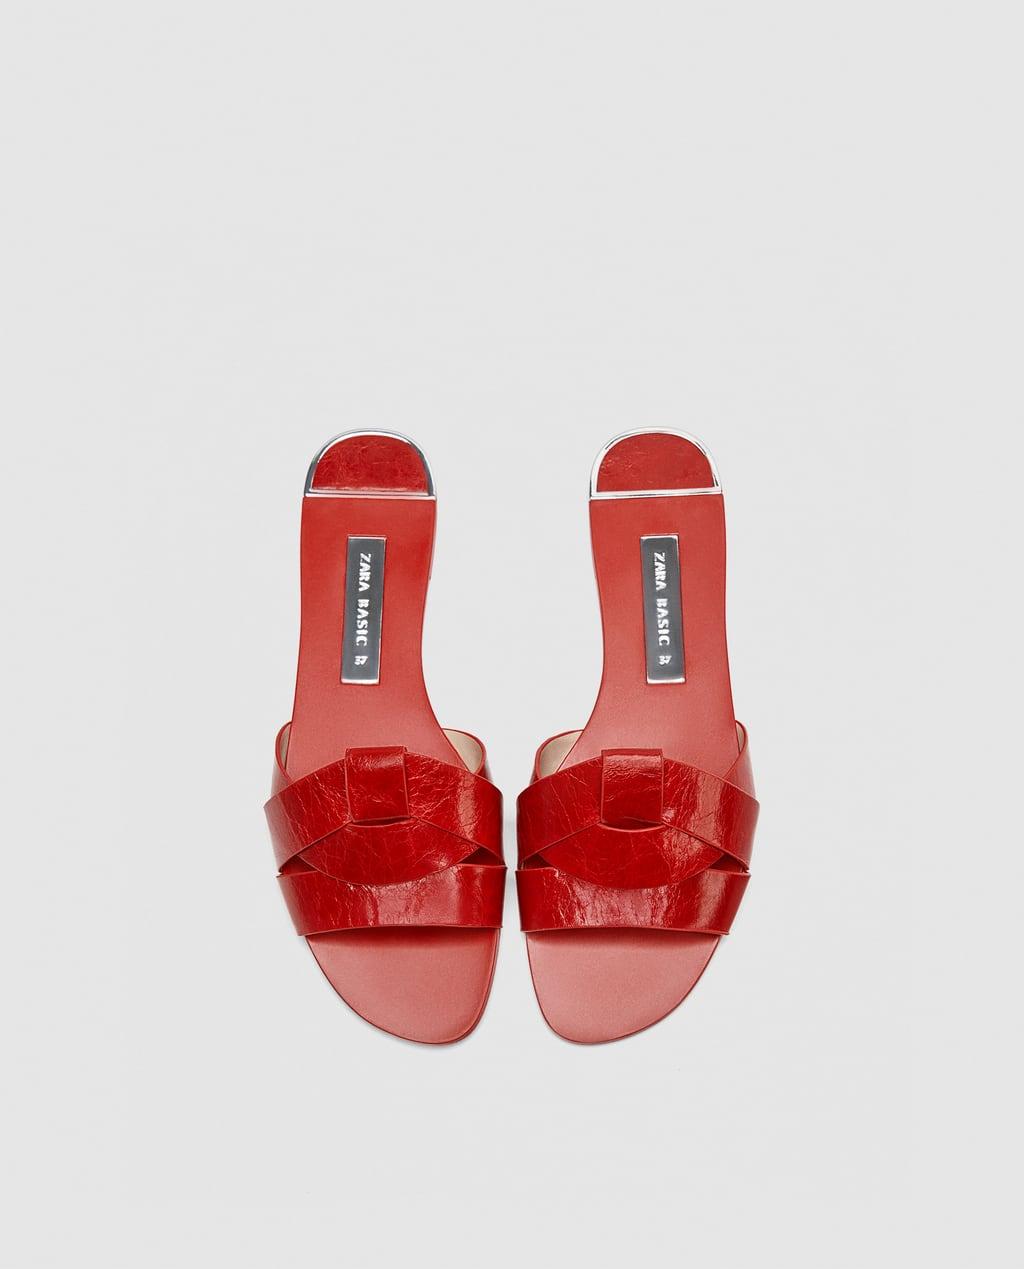 Zara-leather-crossover-sandals.jpg